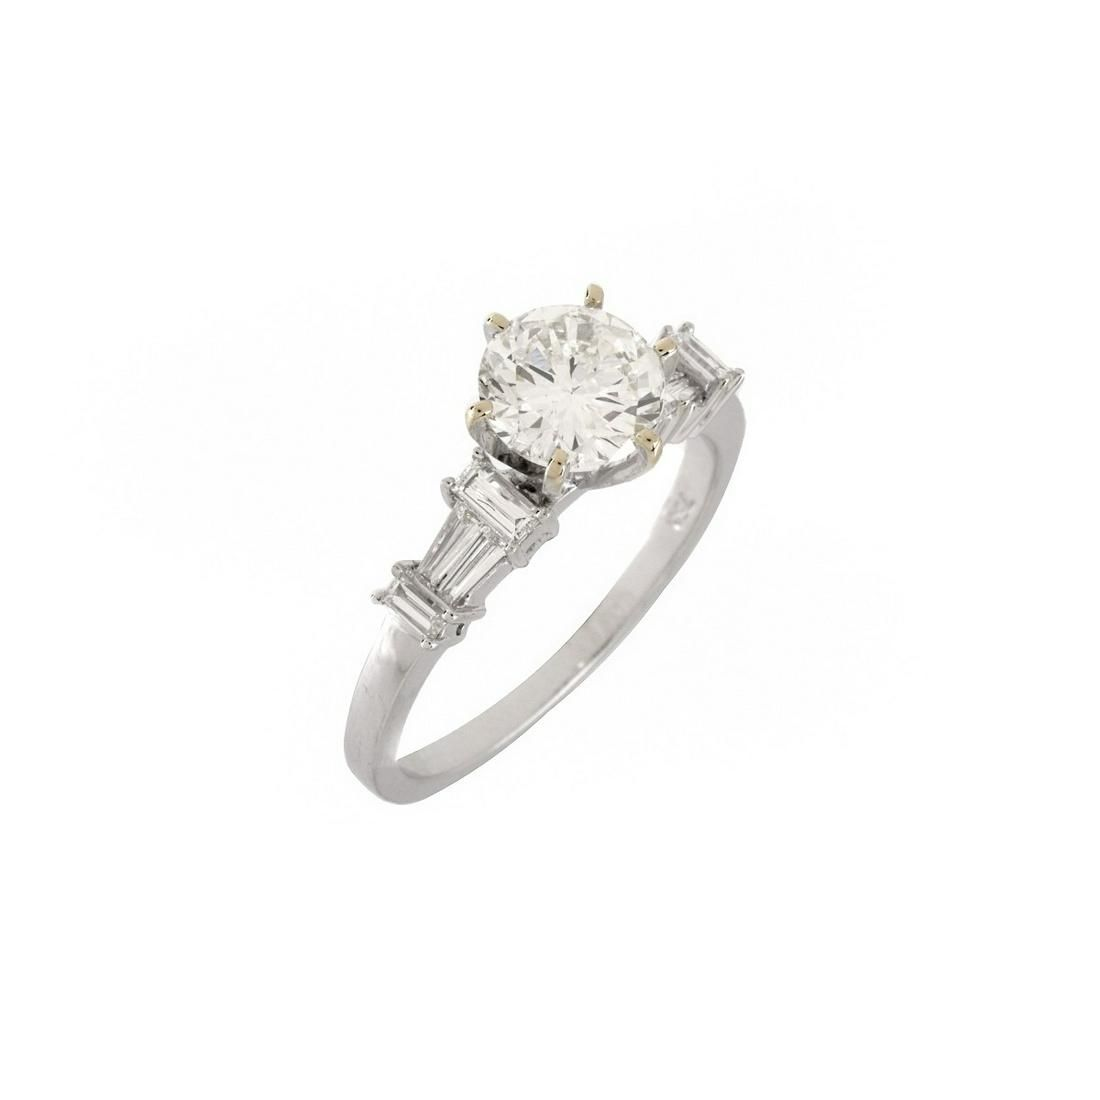 GIA Diamond Engagement Ring